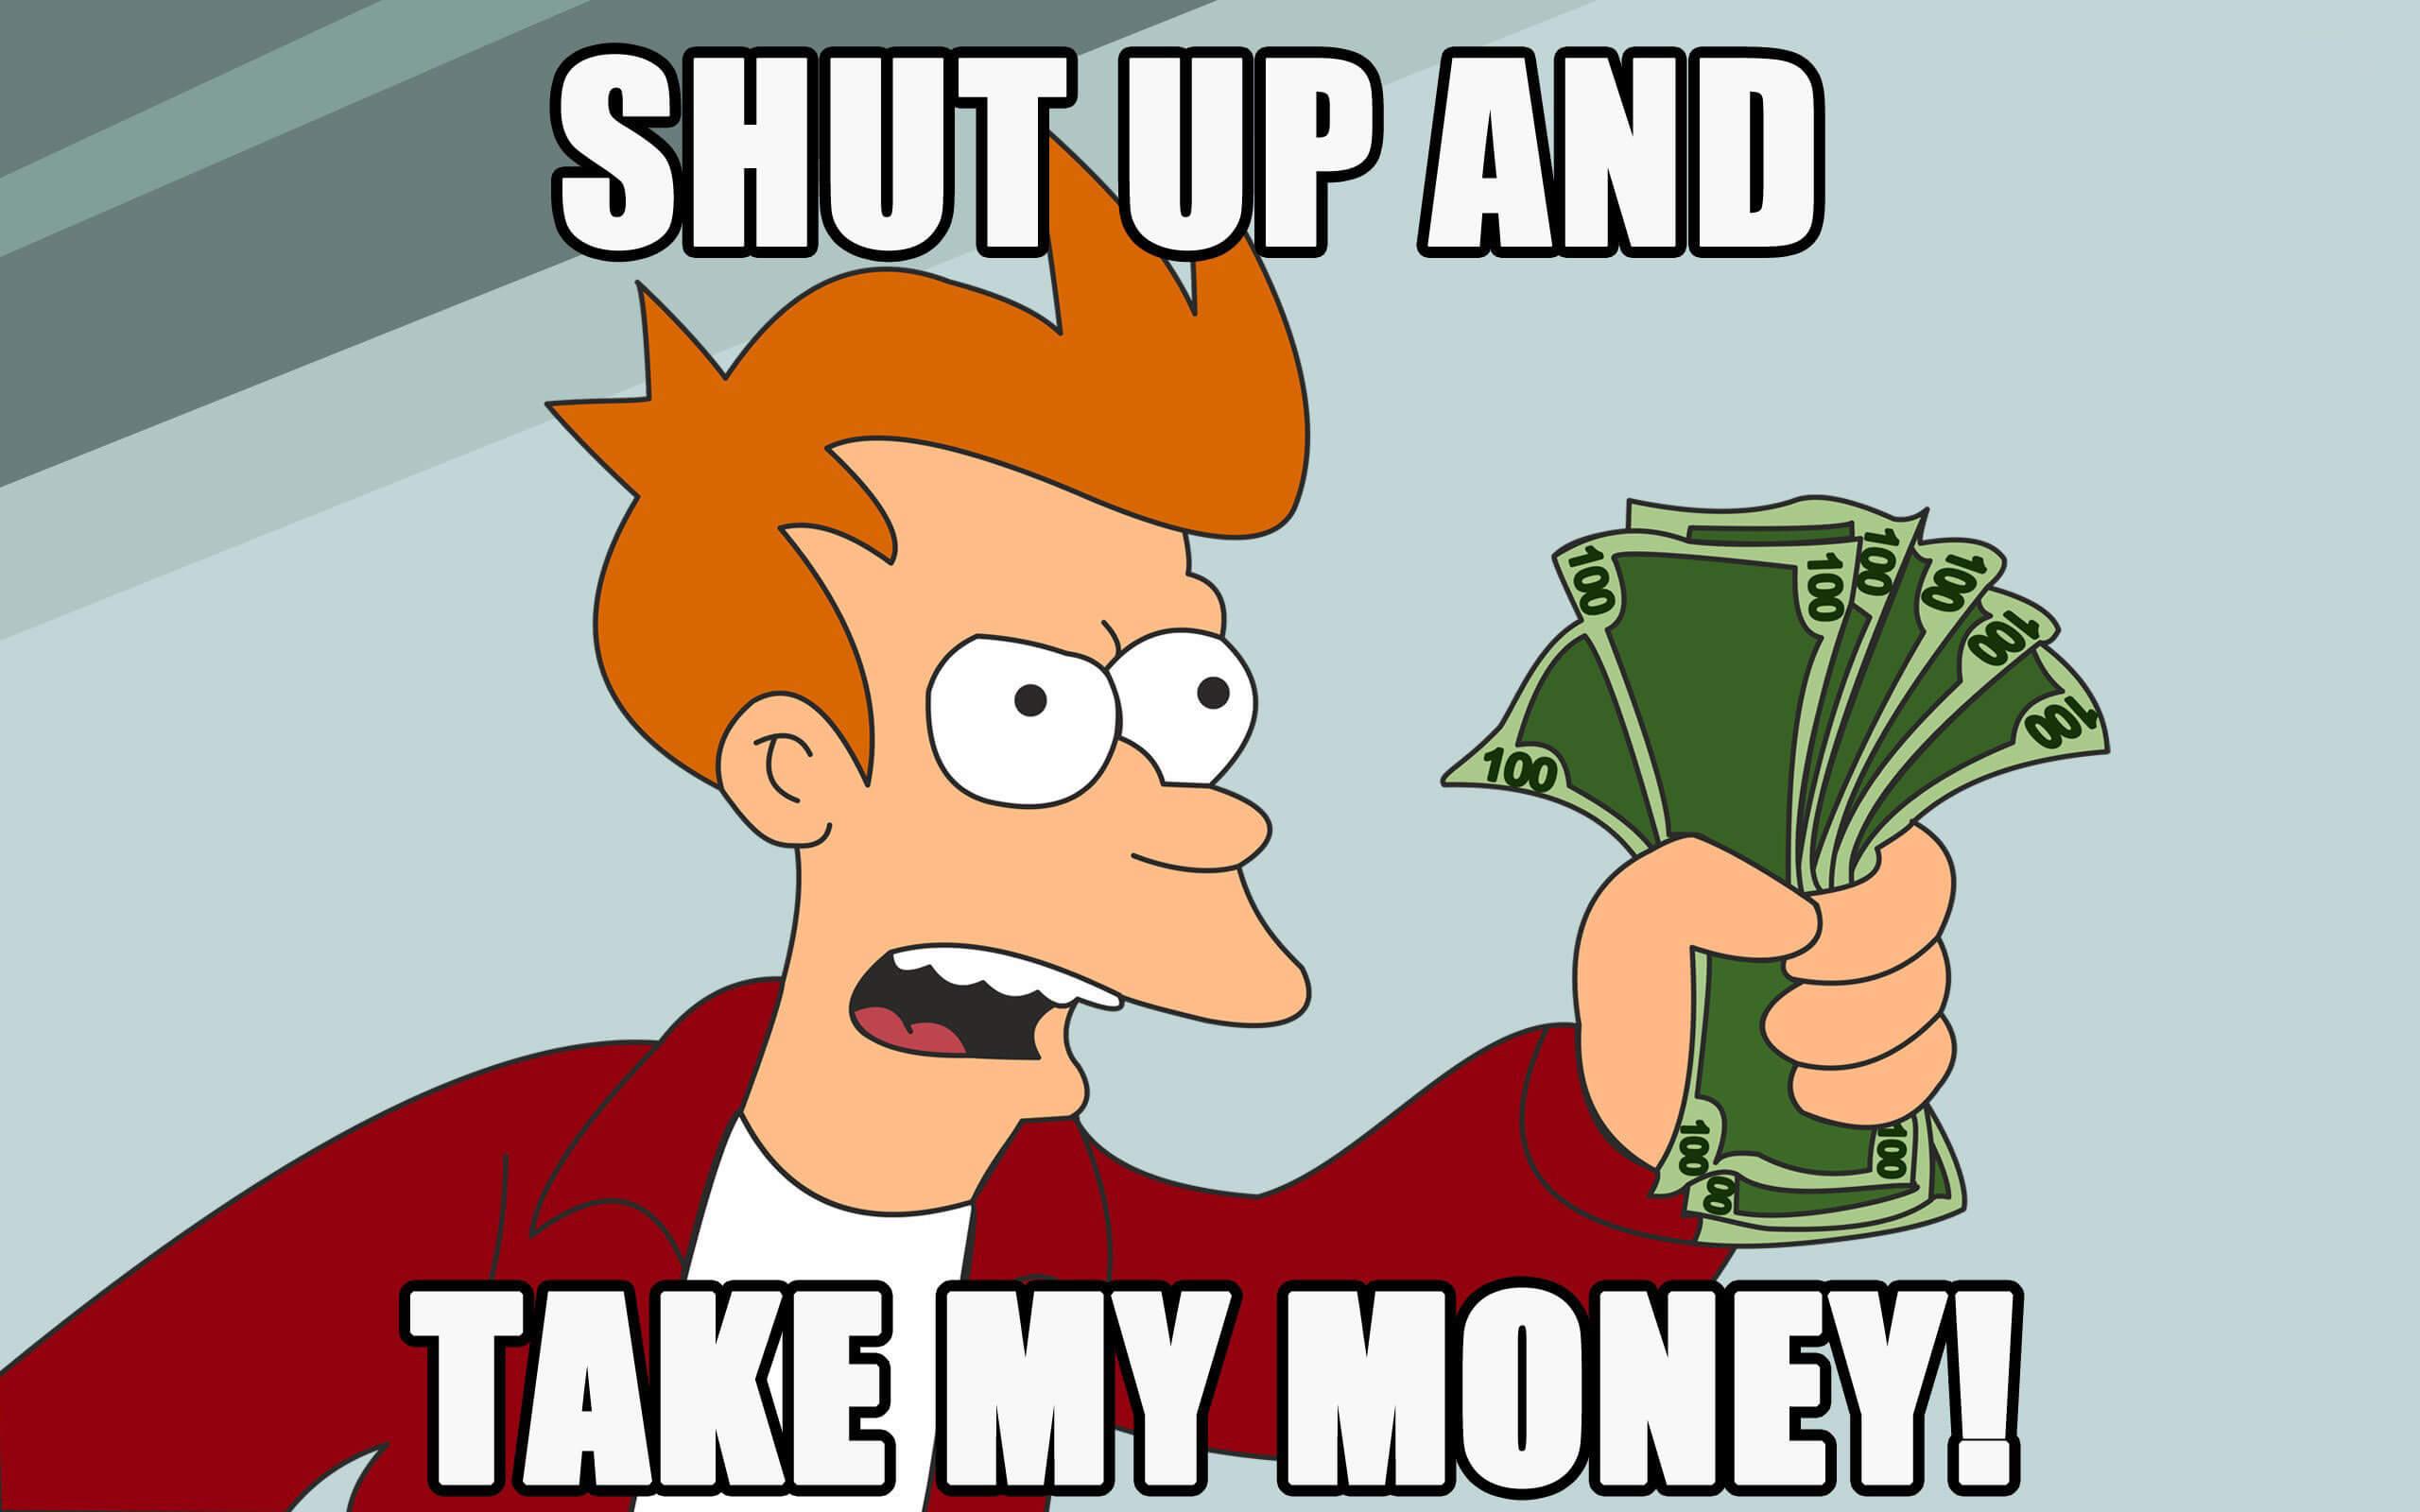 Shut up and take my money - officeflucht.de